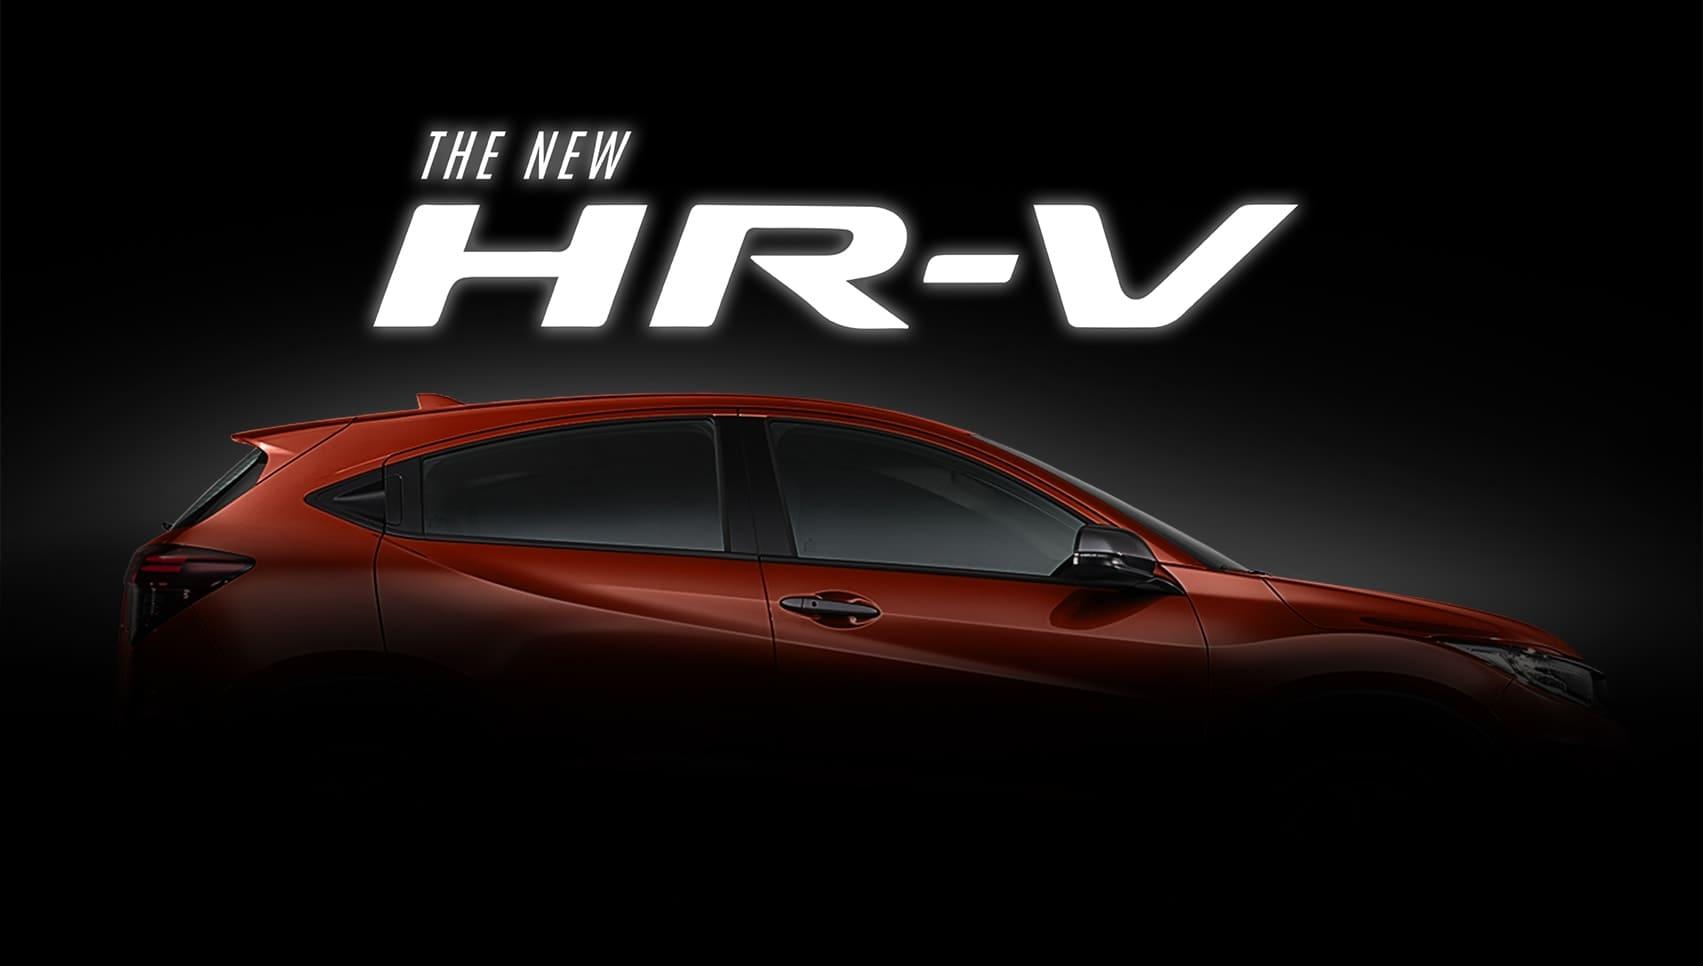 Honda Cars PH to Launch Updated Honda HR-V this August